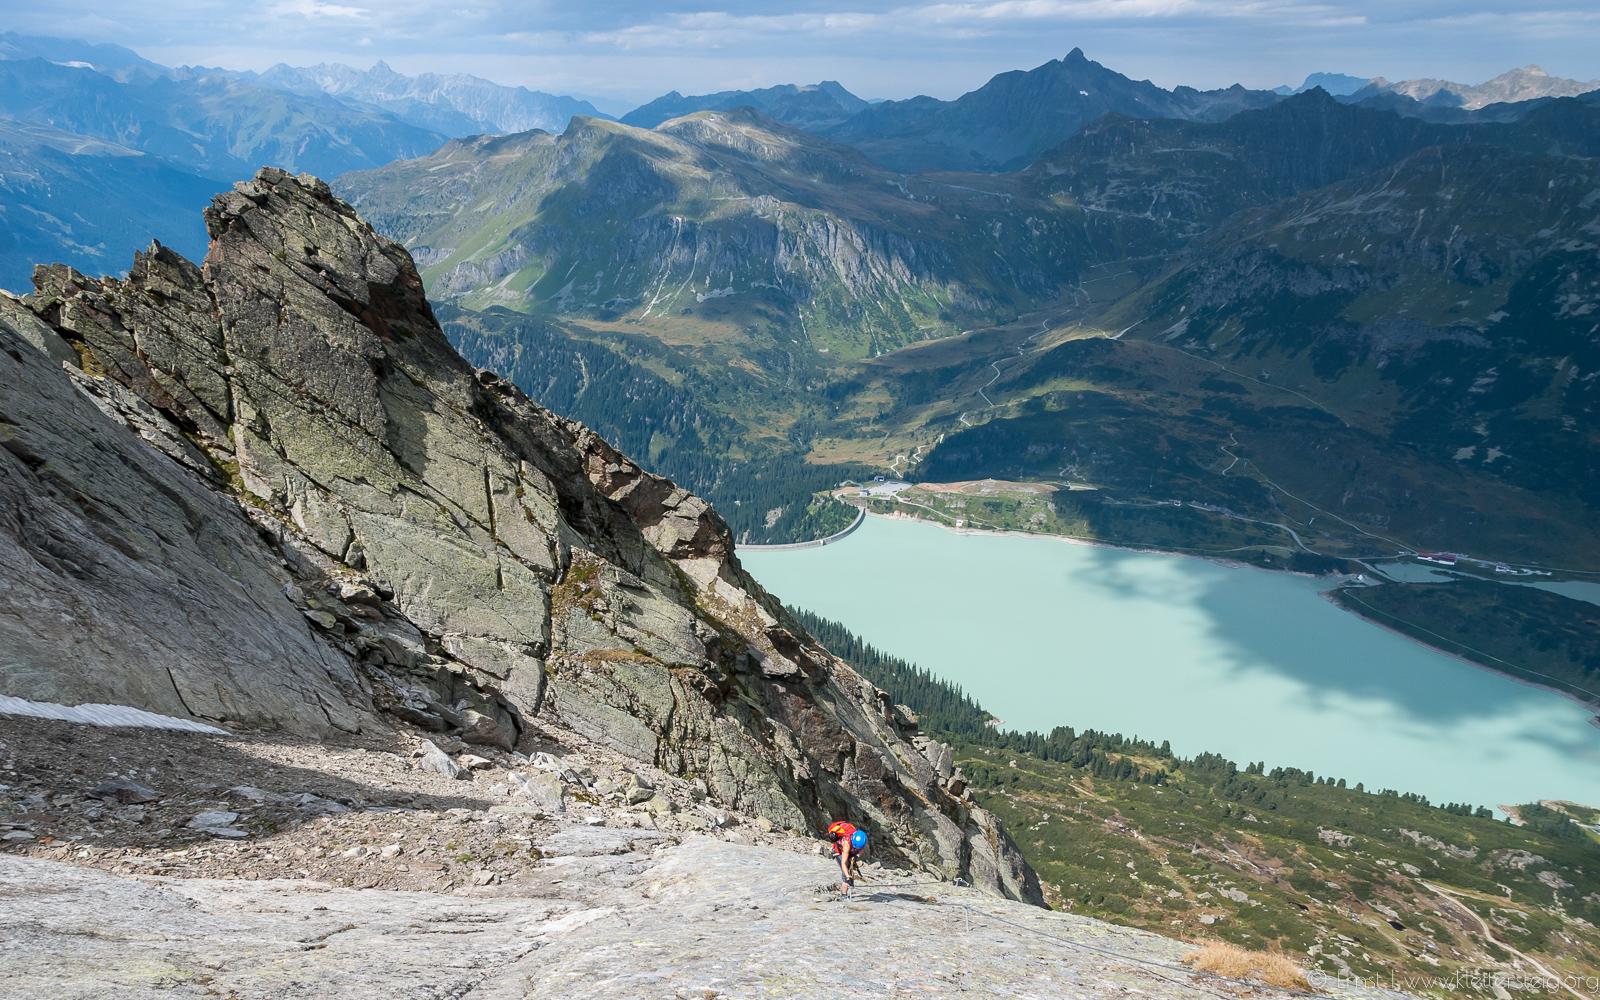 Silvapark Klettersteig Galtür - Balunspitze